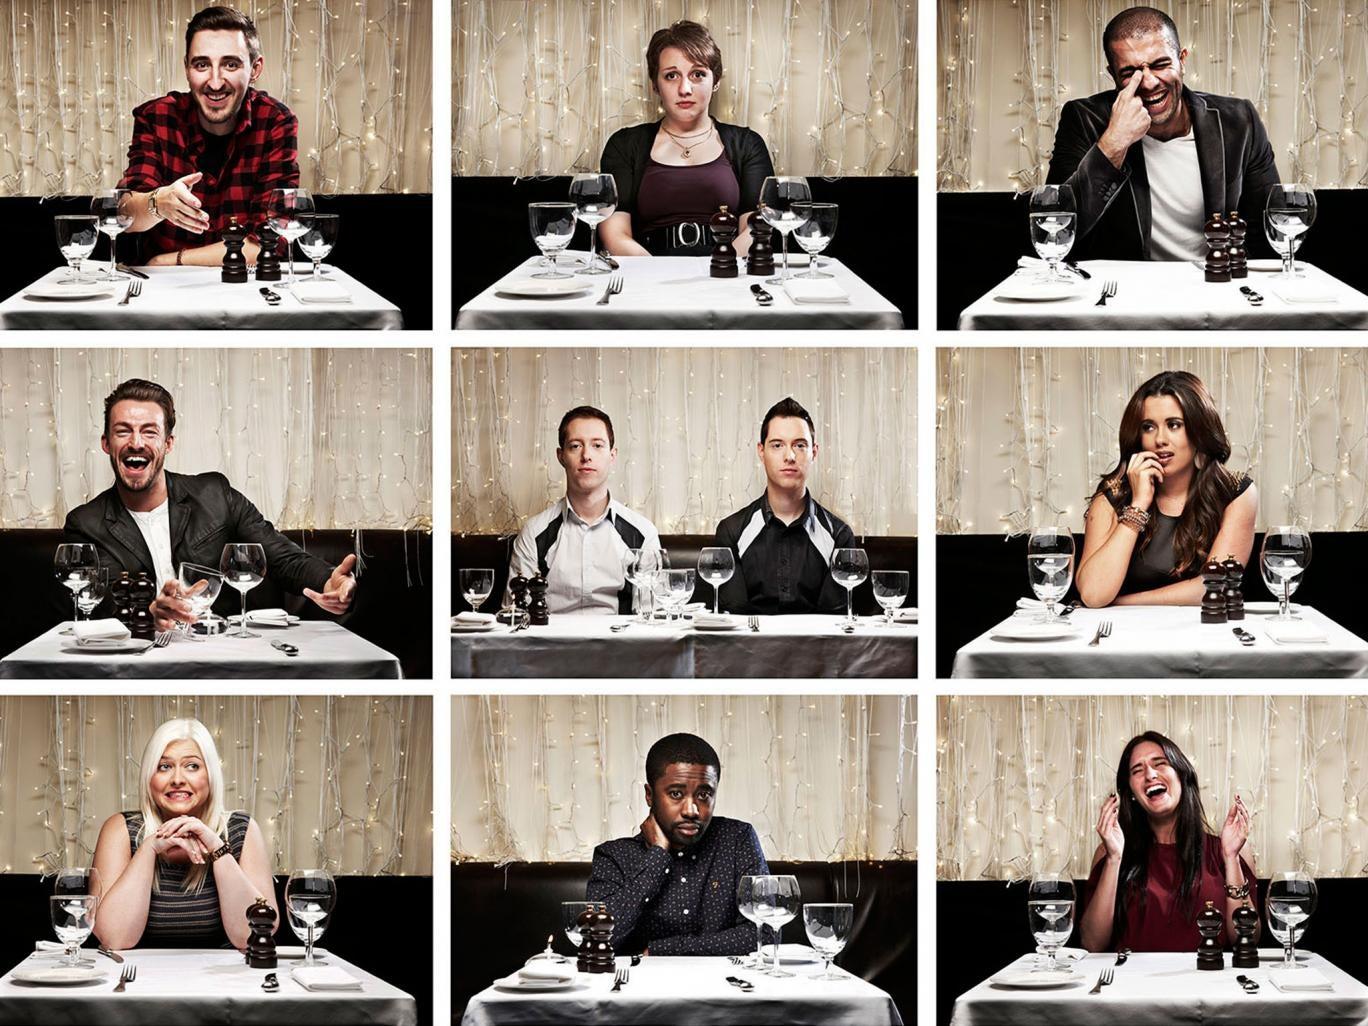 Channel 4 set to launch new survival show called Escape